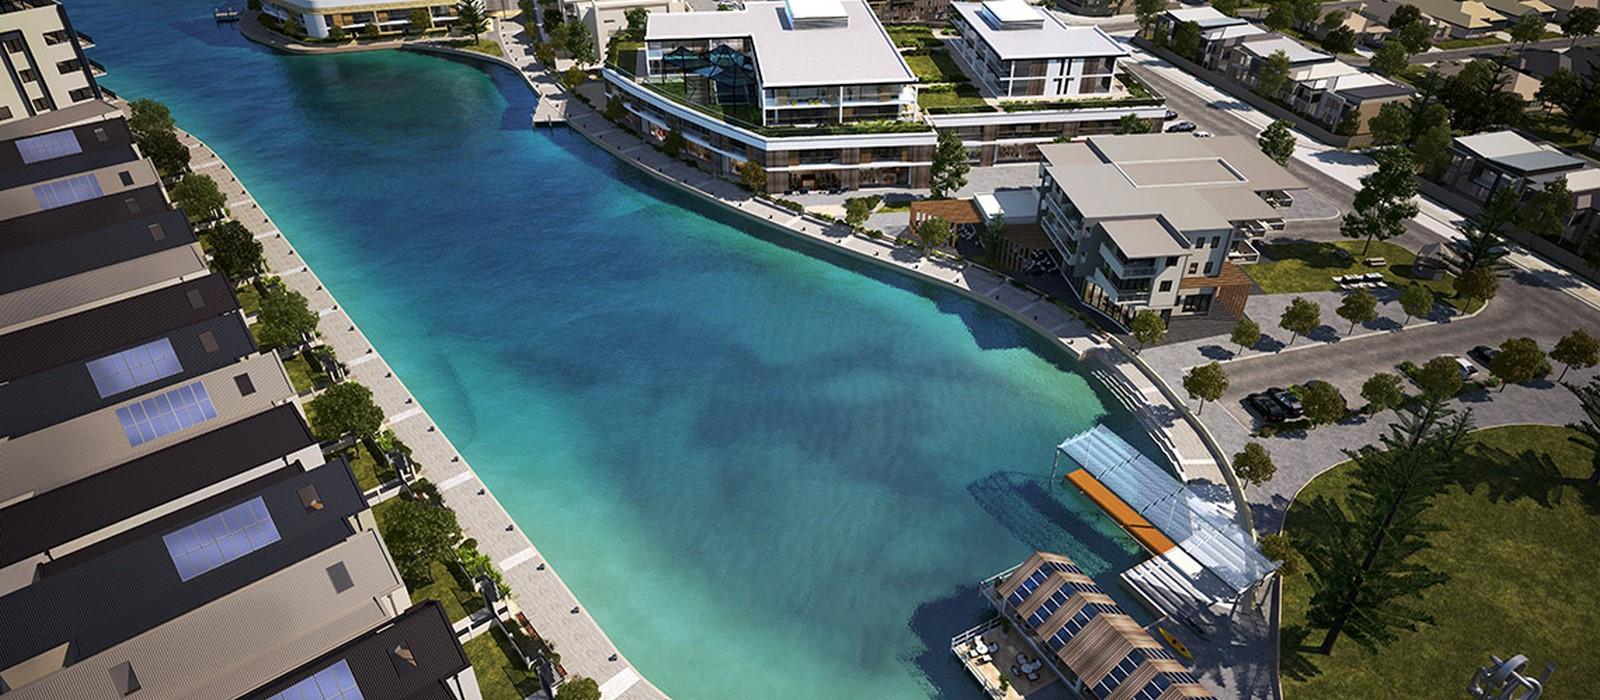 Port Geographe Urban Design Review & Marine Village Concept, Busselton, Western Australia - Sheet3